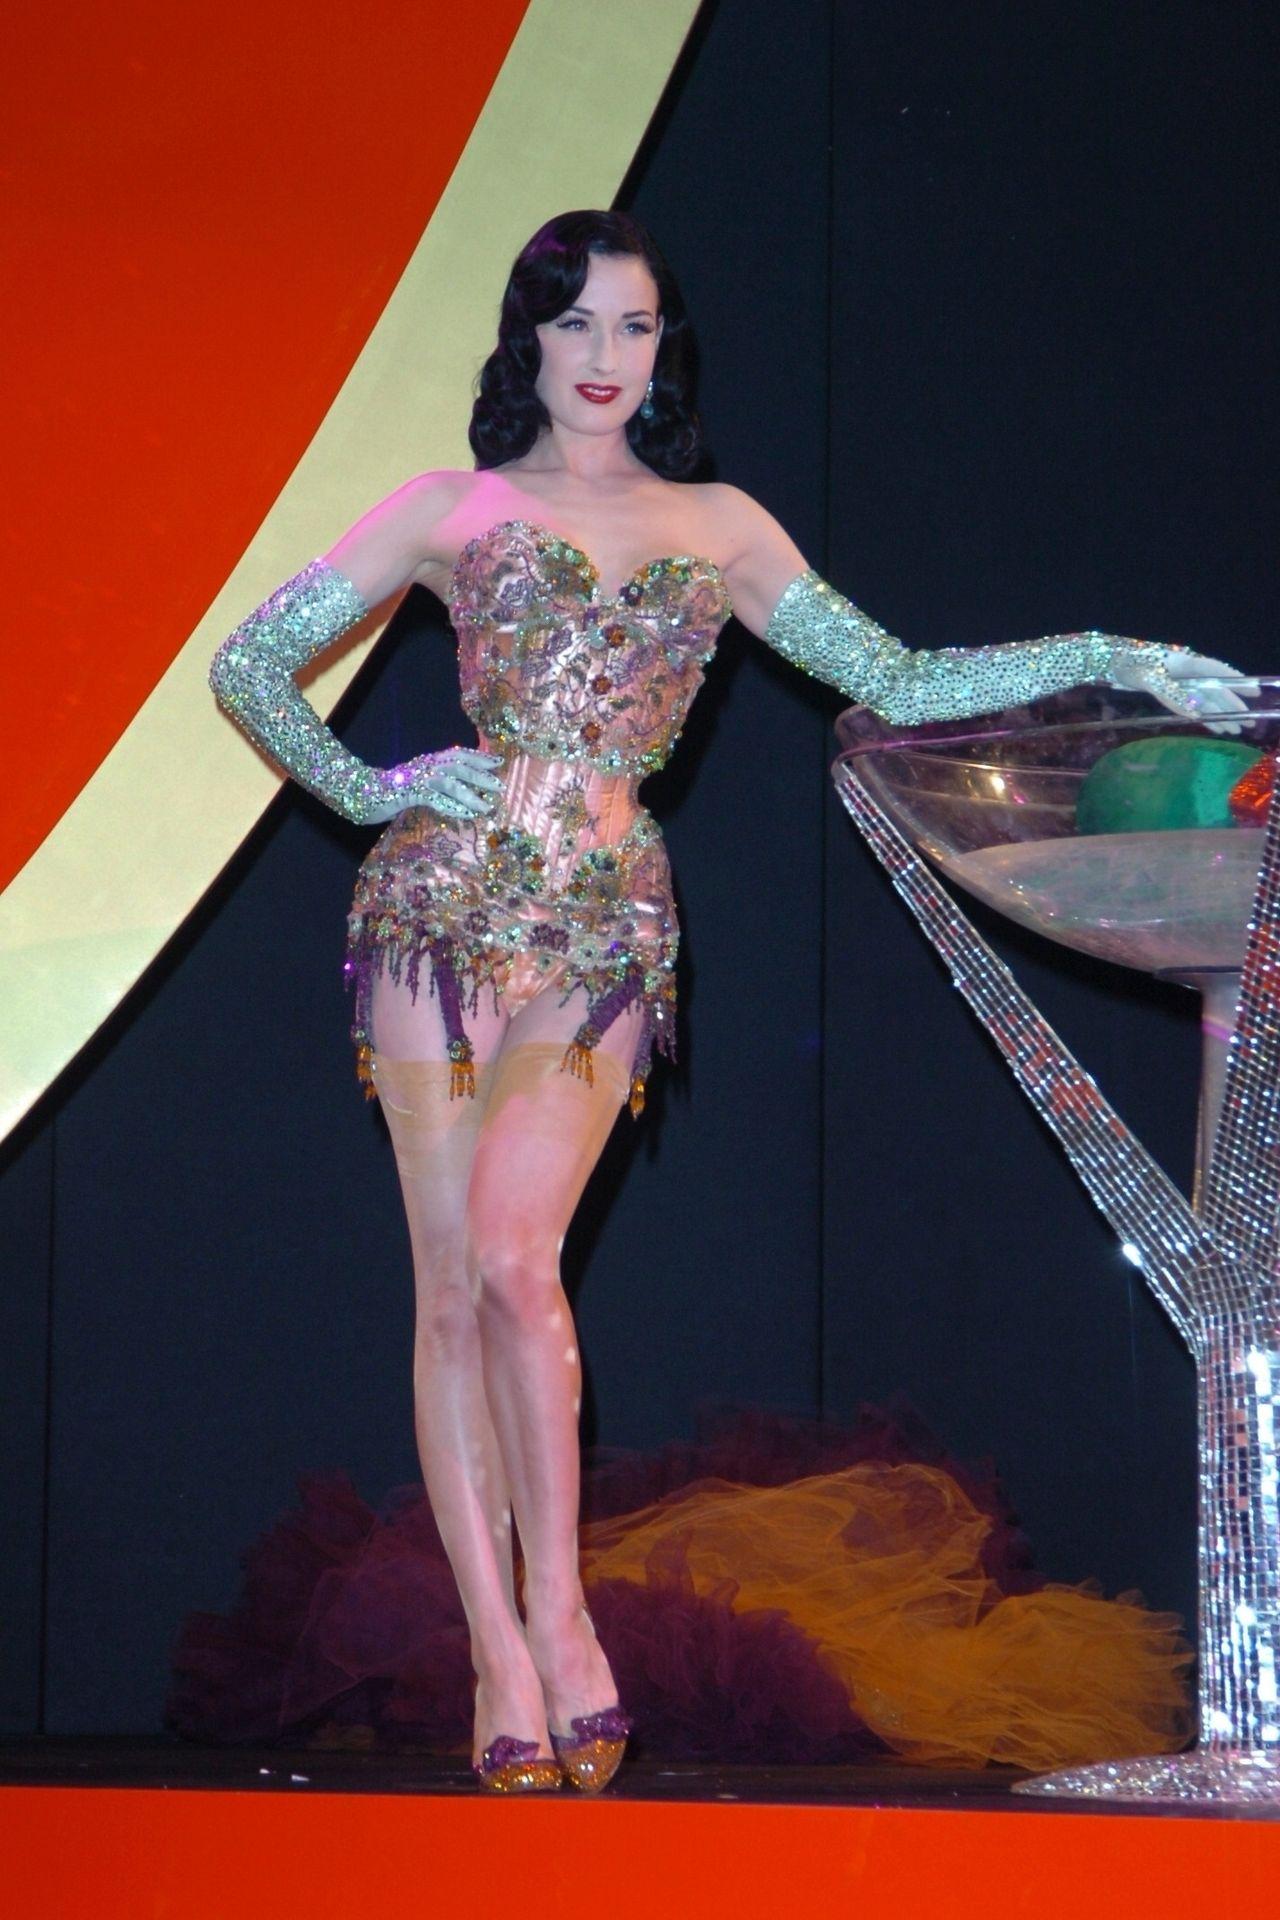 Dita Von Teese Performs At Erotica 06 In London 0011